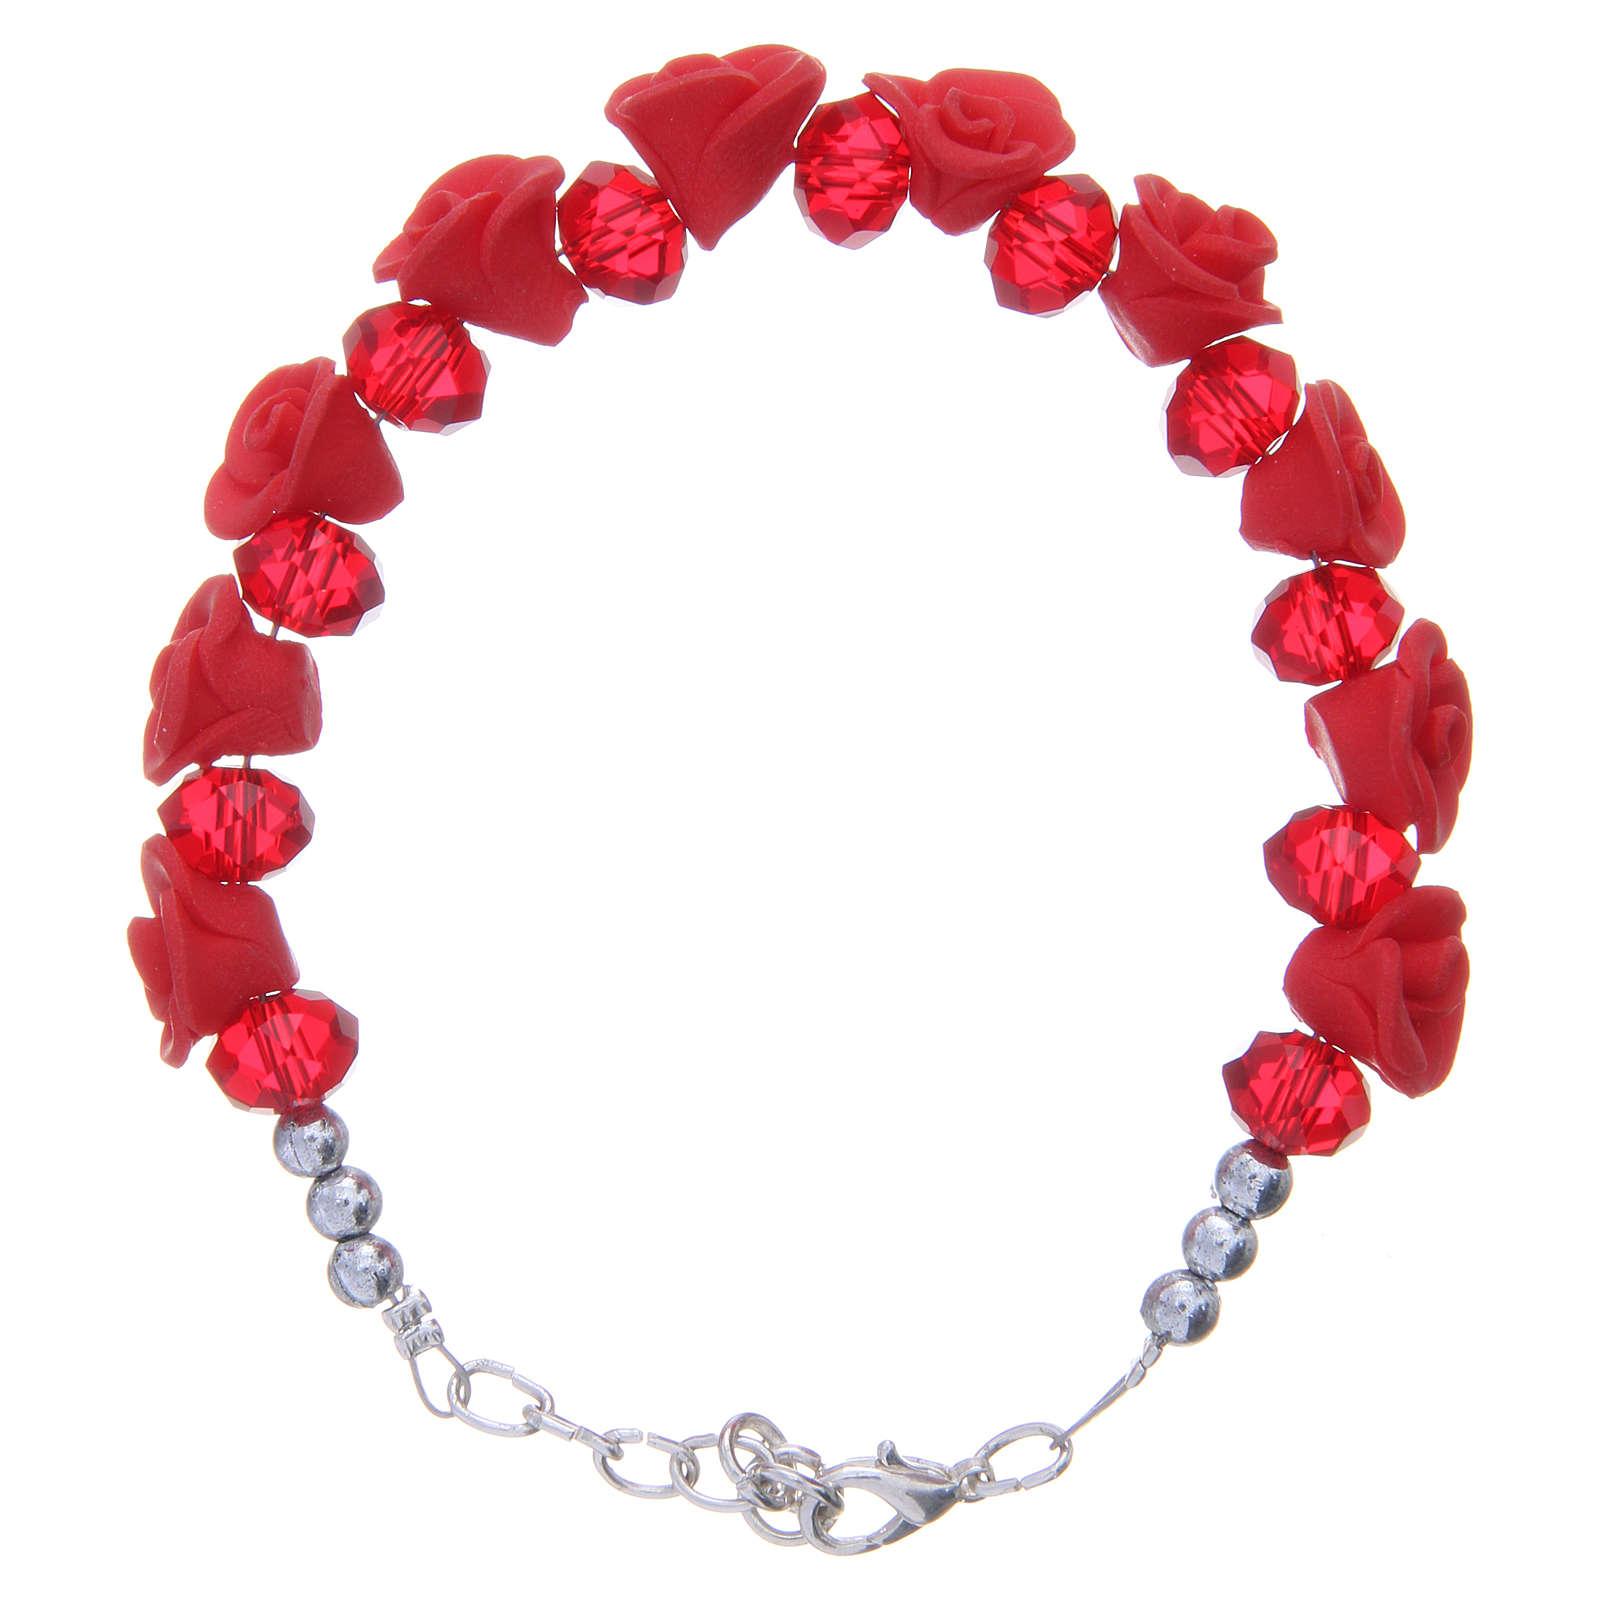 Bracciale Medjugorje rose rosse ceramica grani cristallo 4